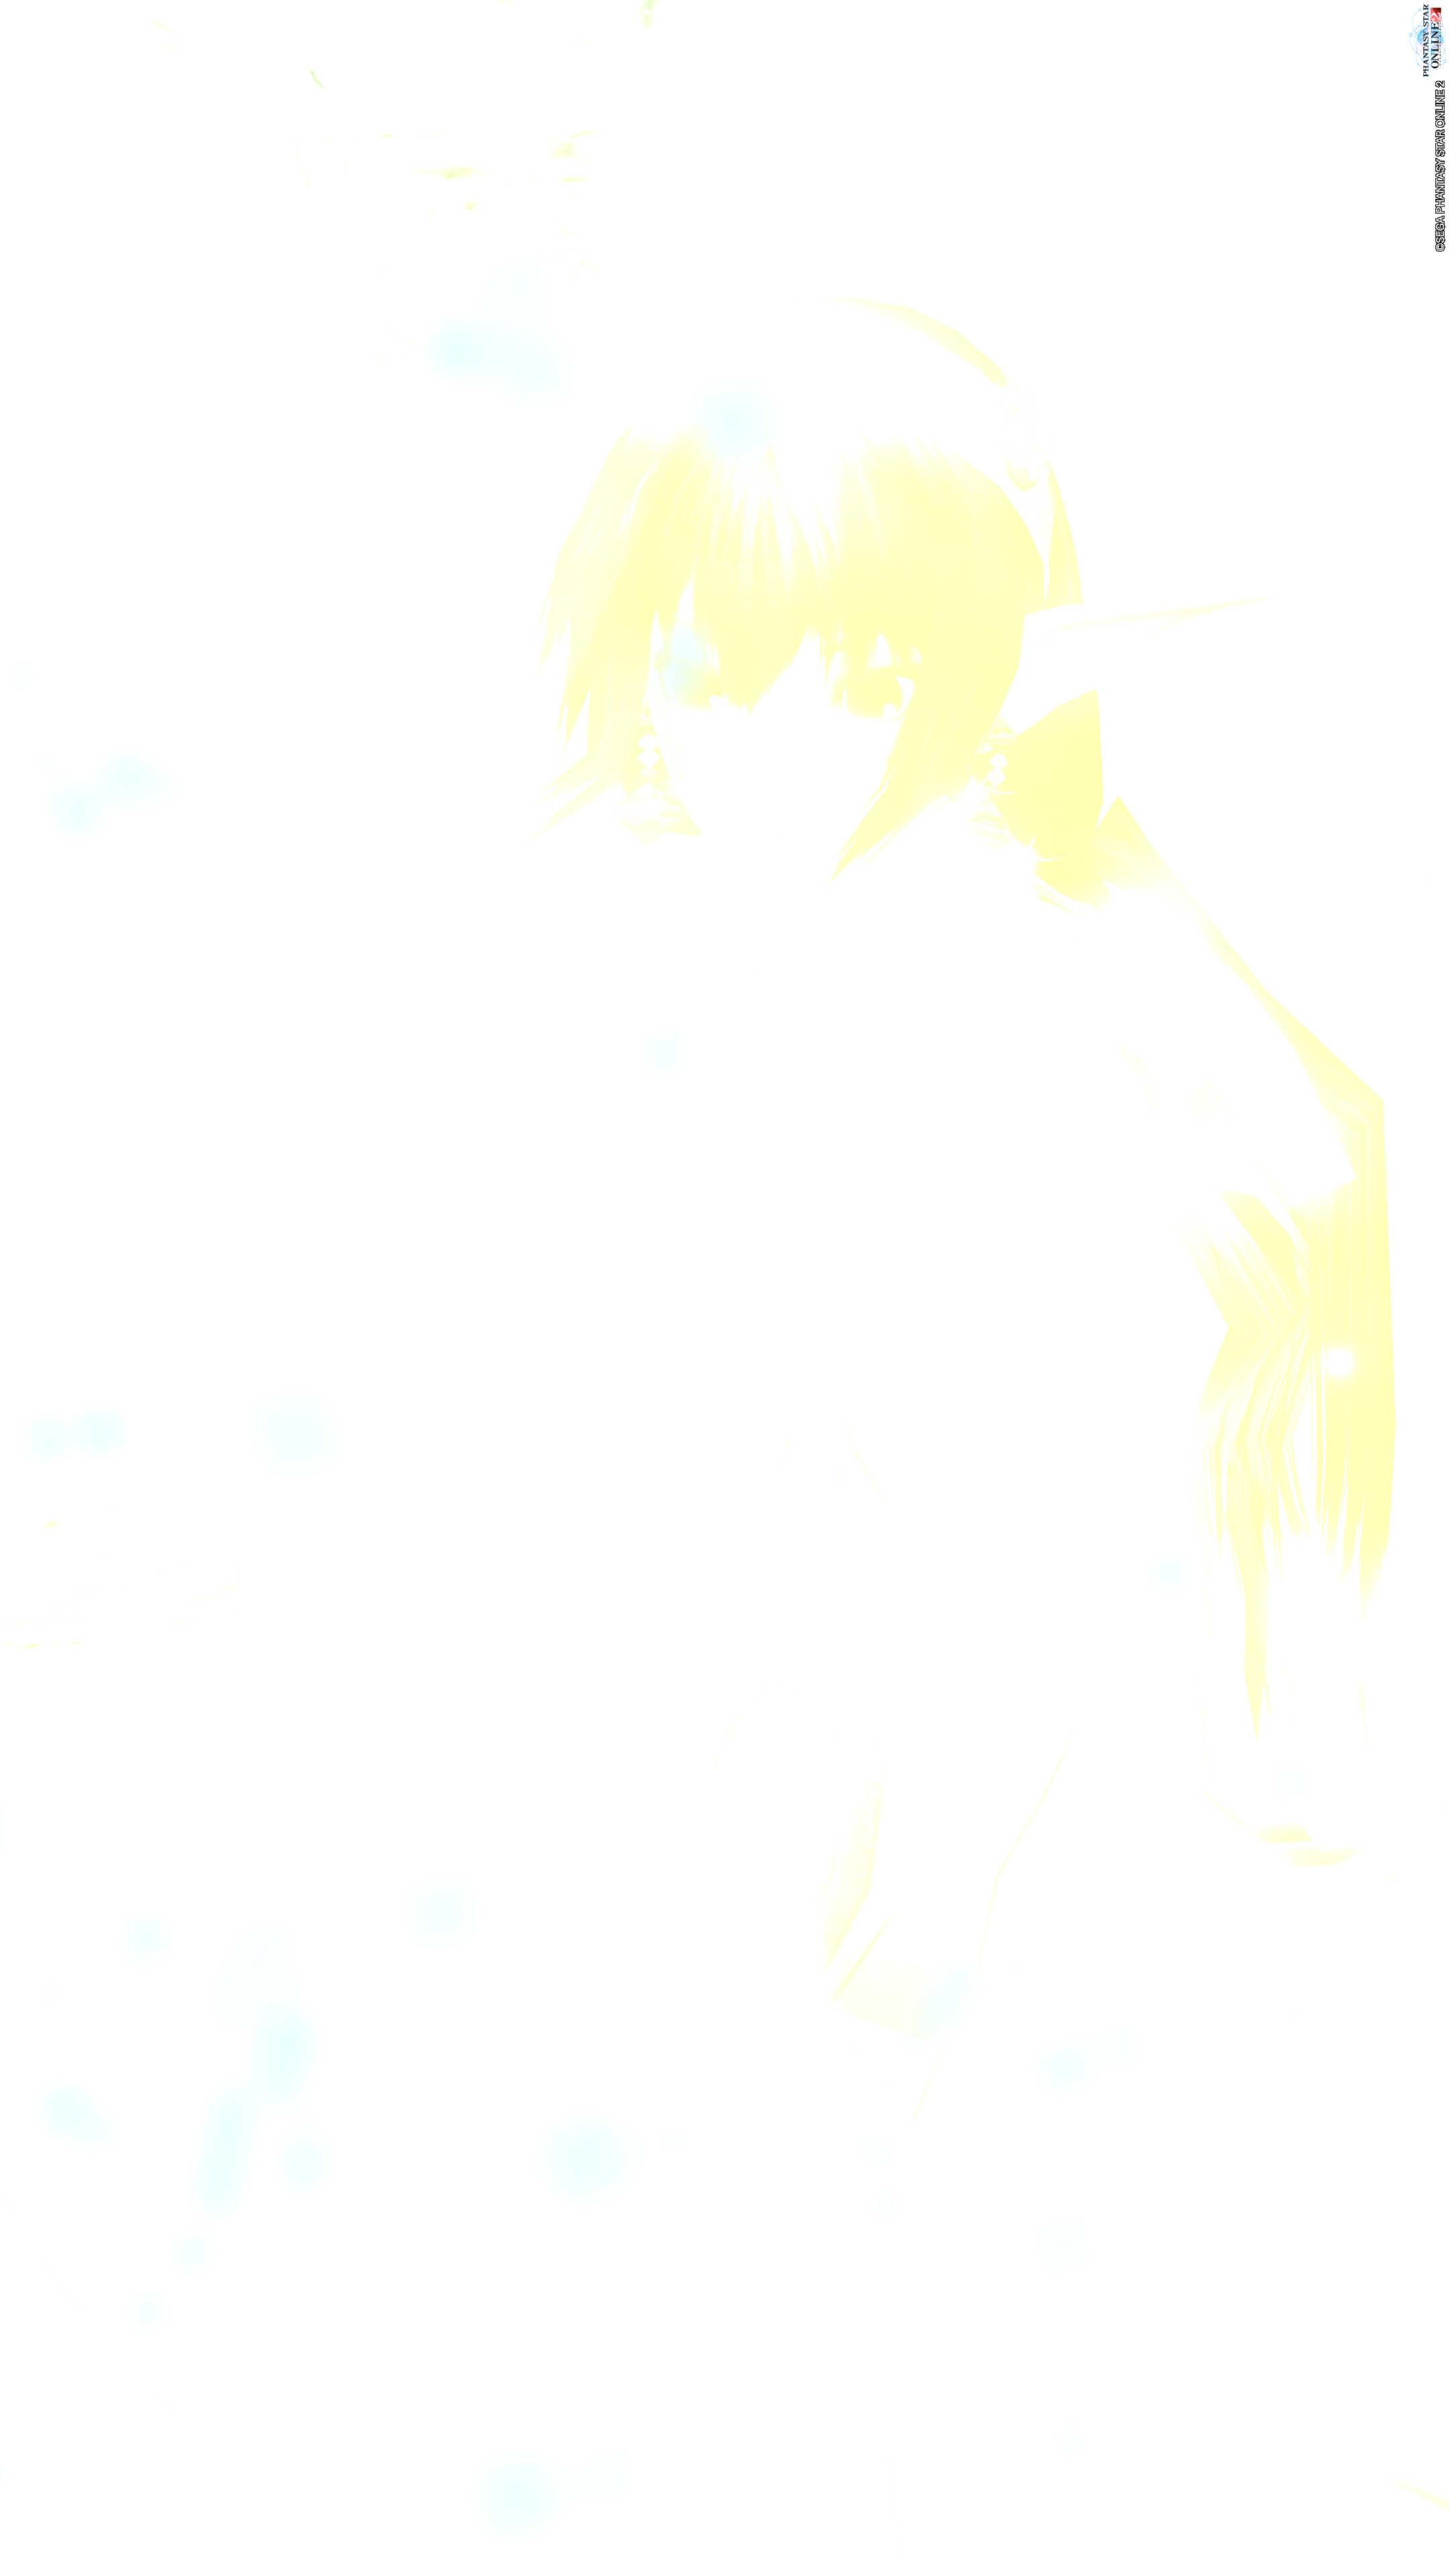 pso(2015-09-20)090.jpg